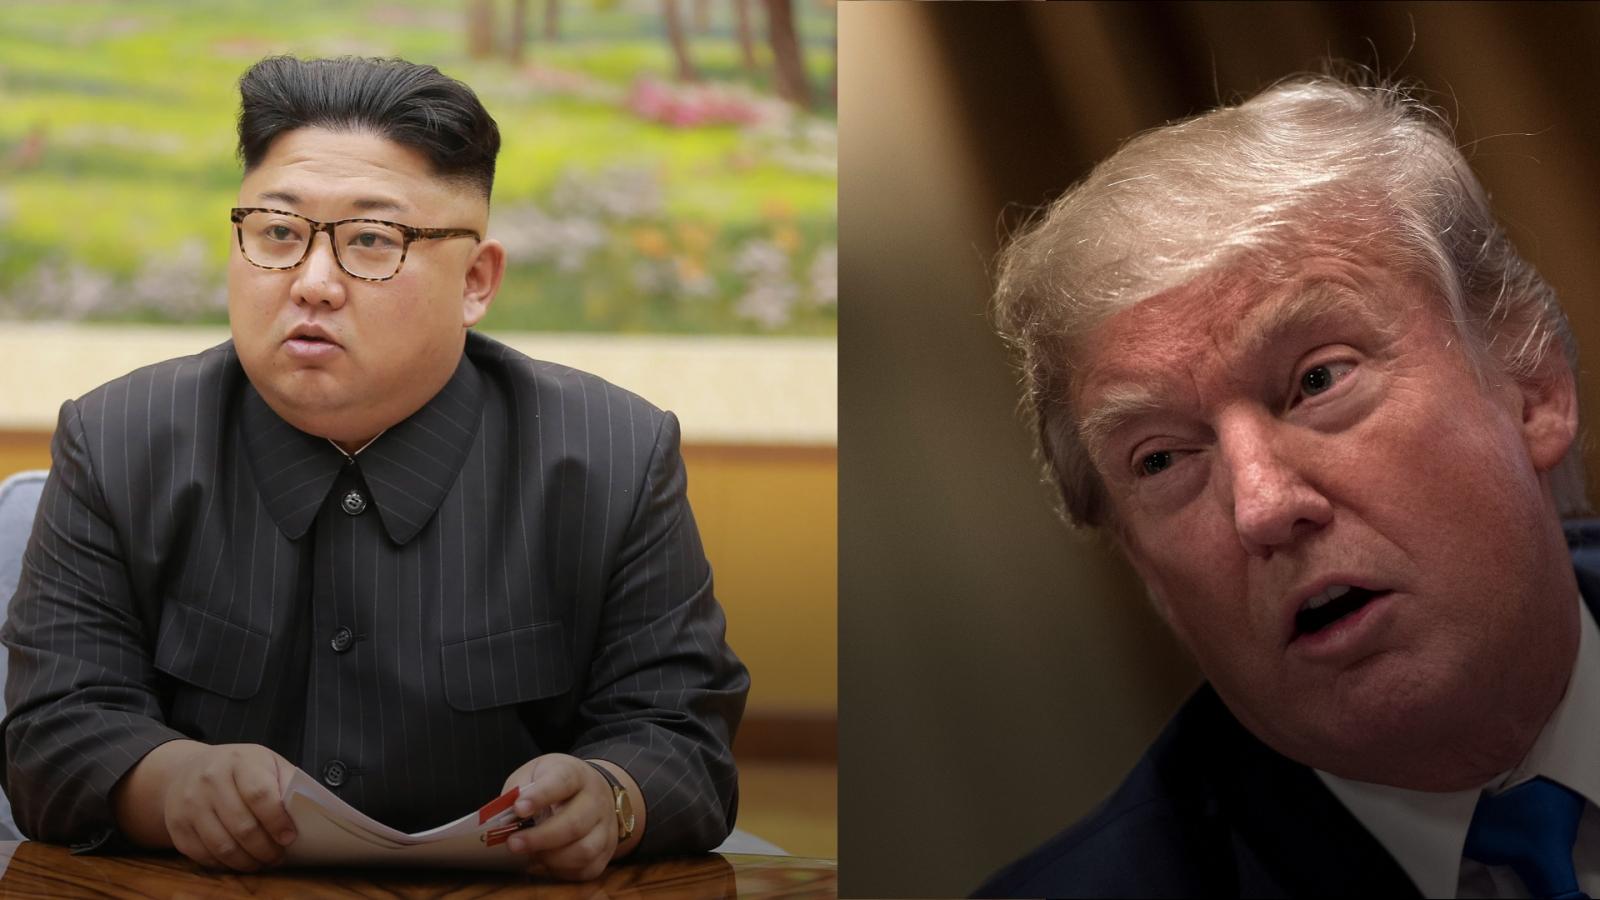 North Korea Calls Trump 'Barking Dog' As War Of Words Escalates